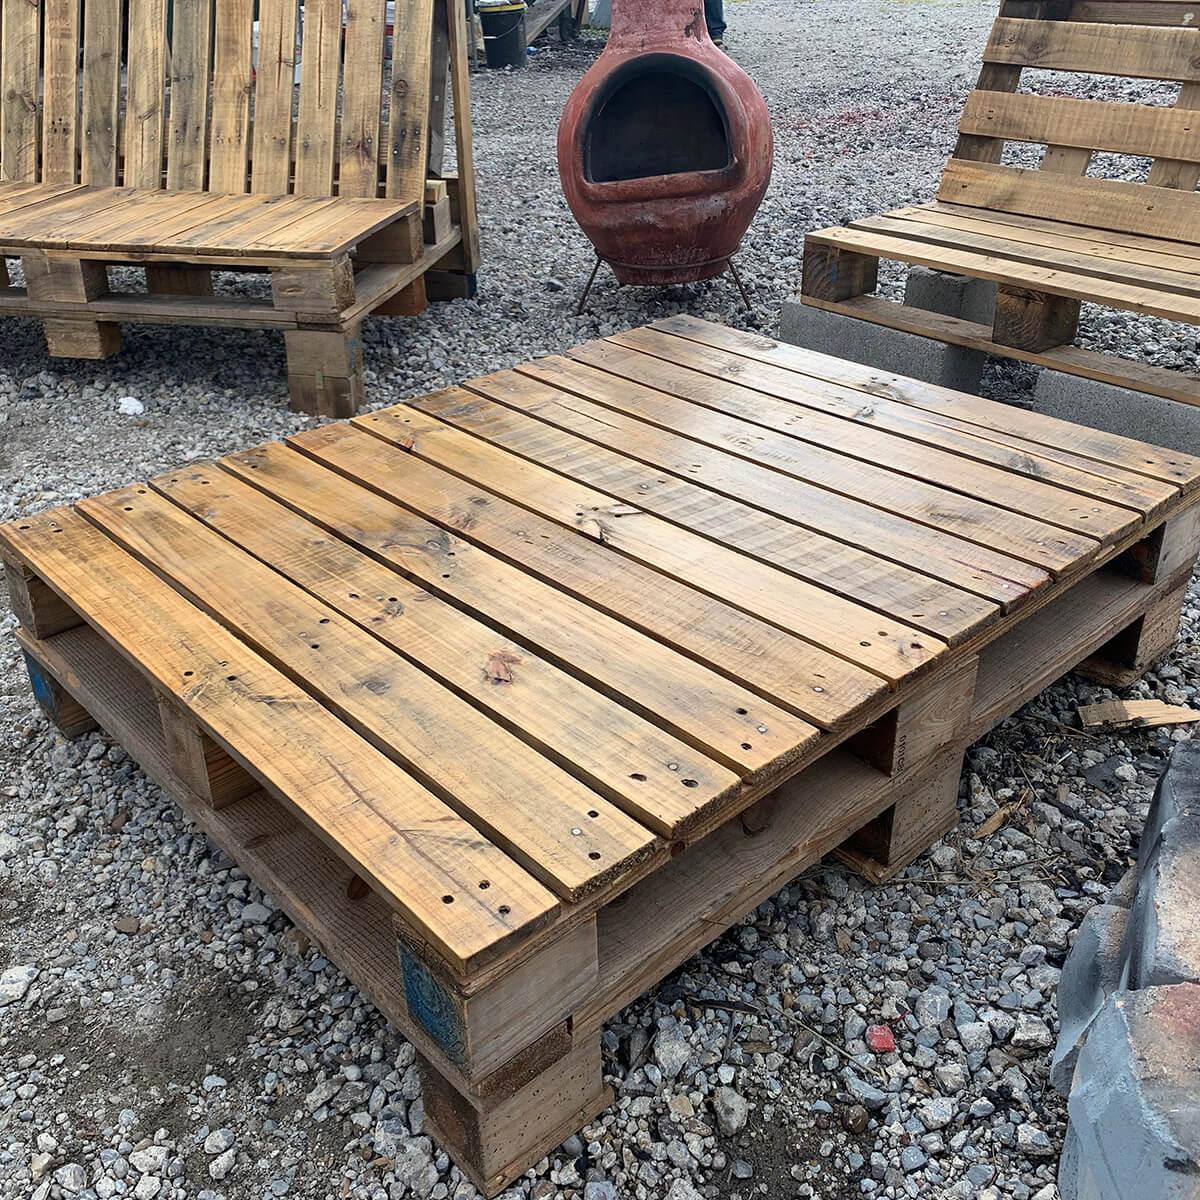 Refurbished Rustic Wooden Pallet Table